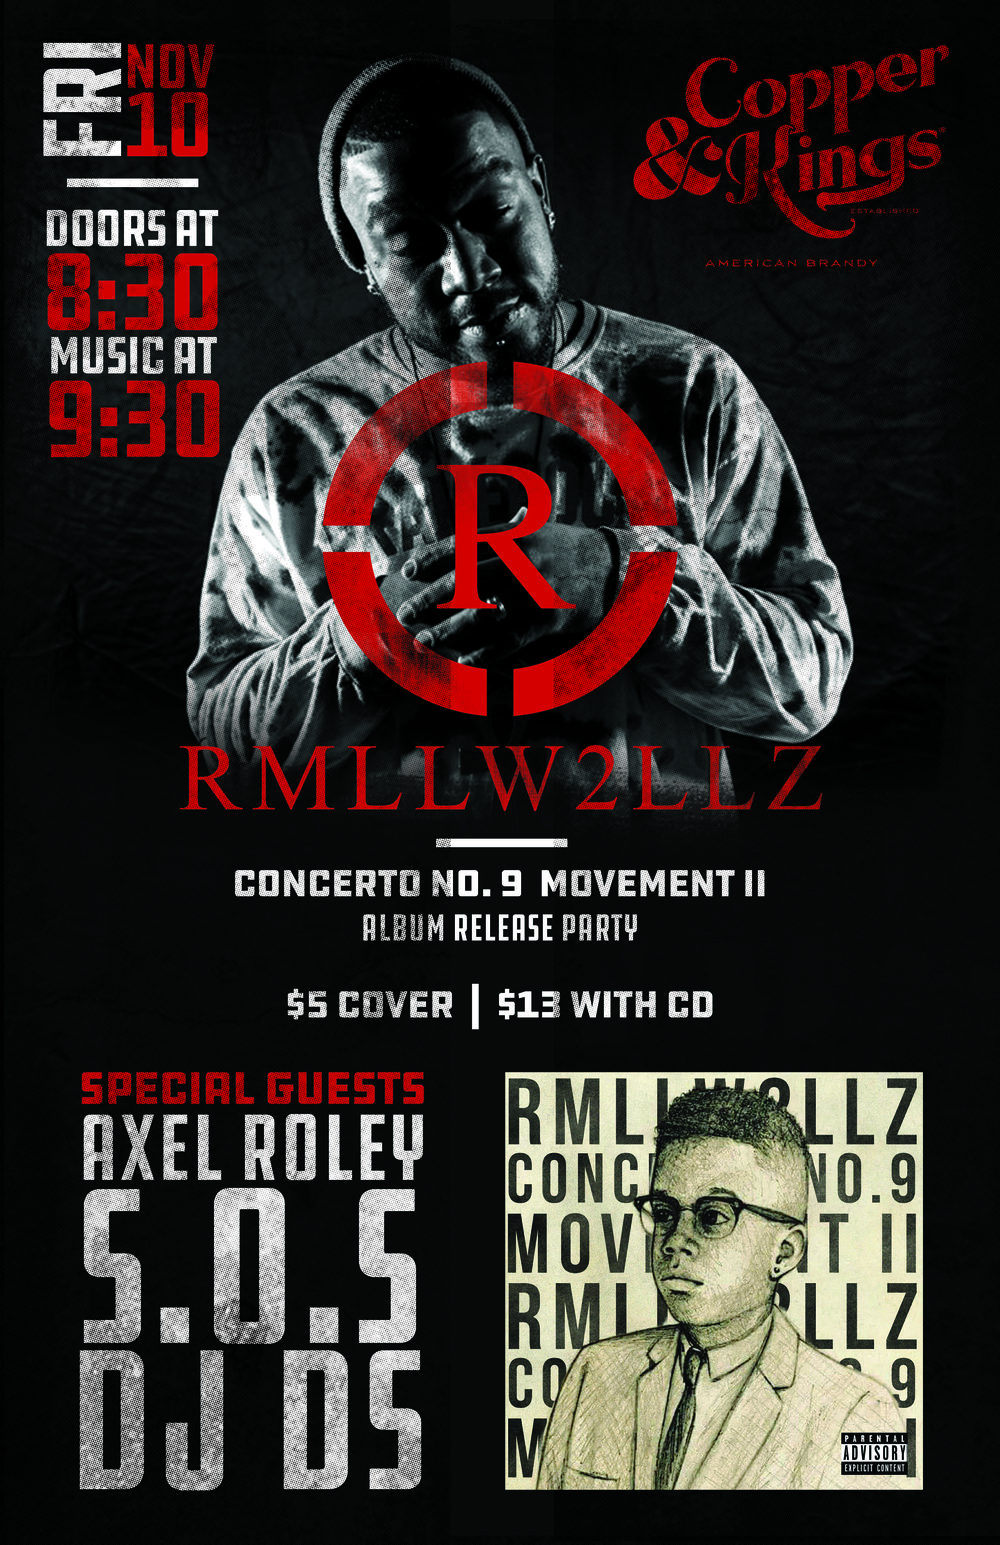 RMLLW2LLZ-AlbumRelease-v2.jpg